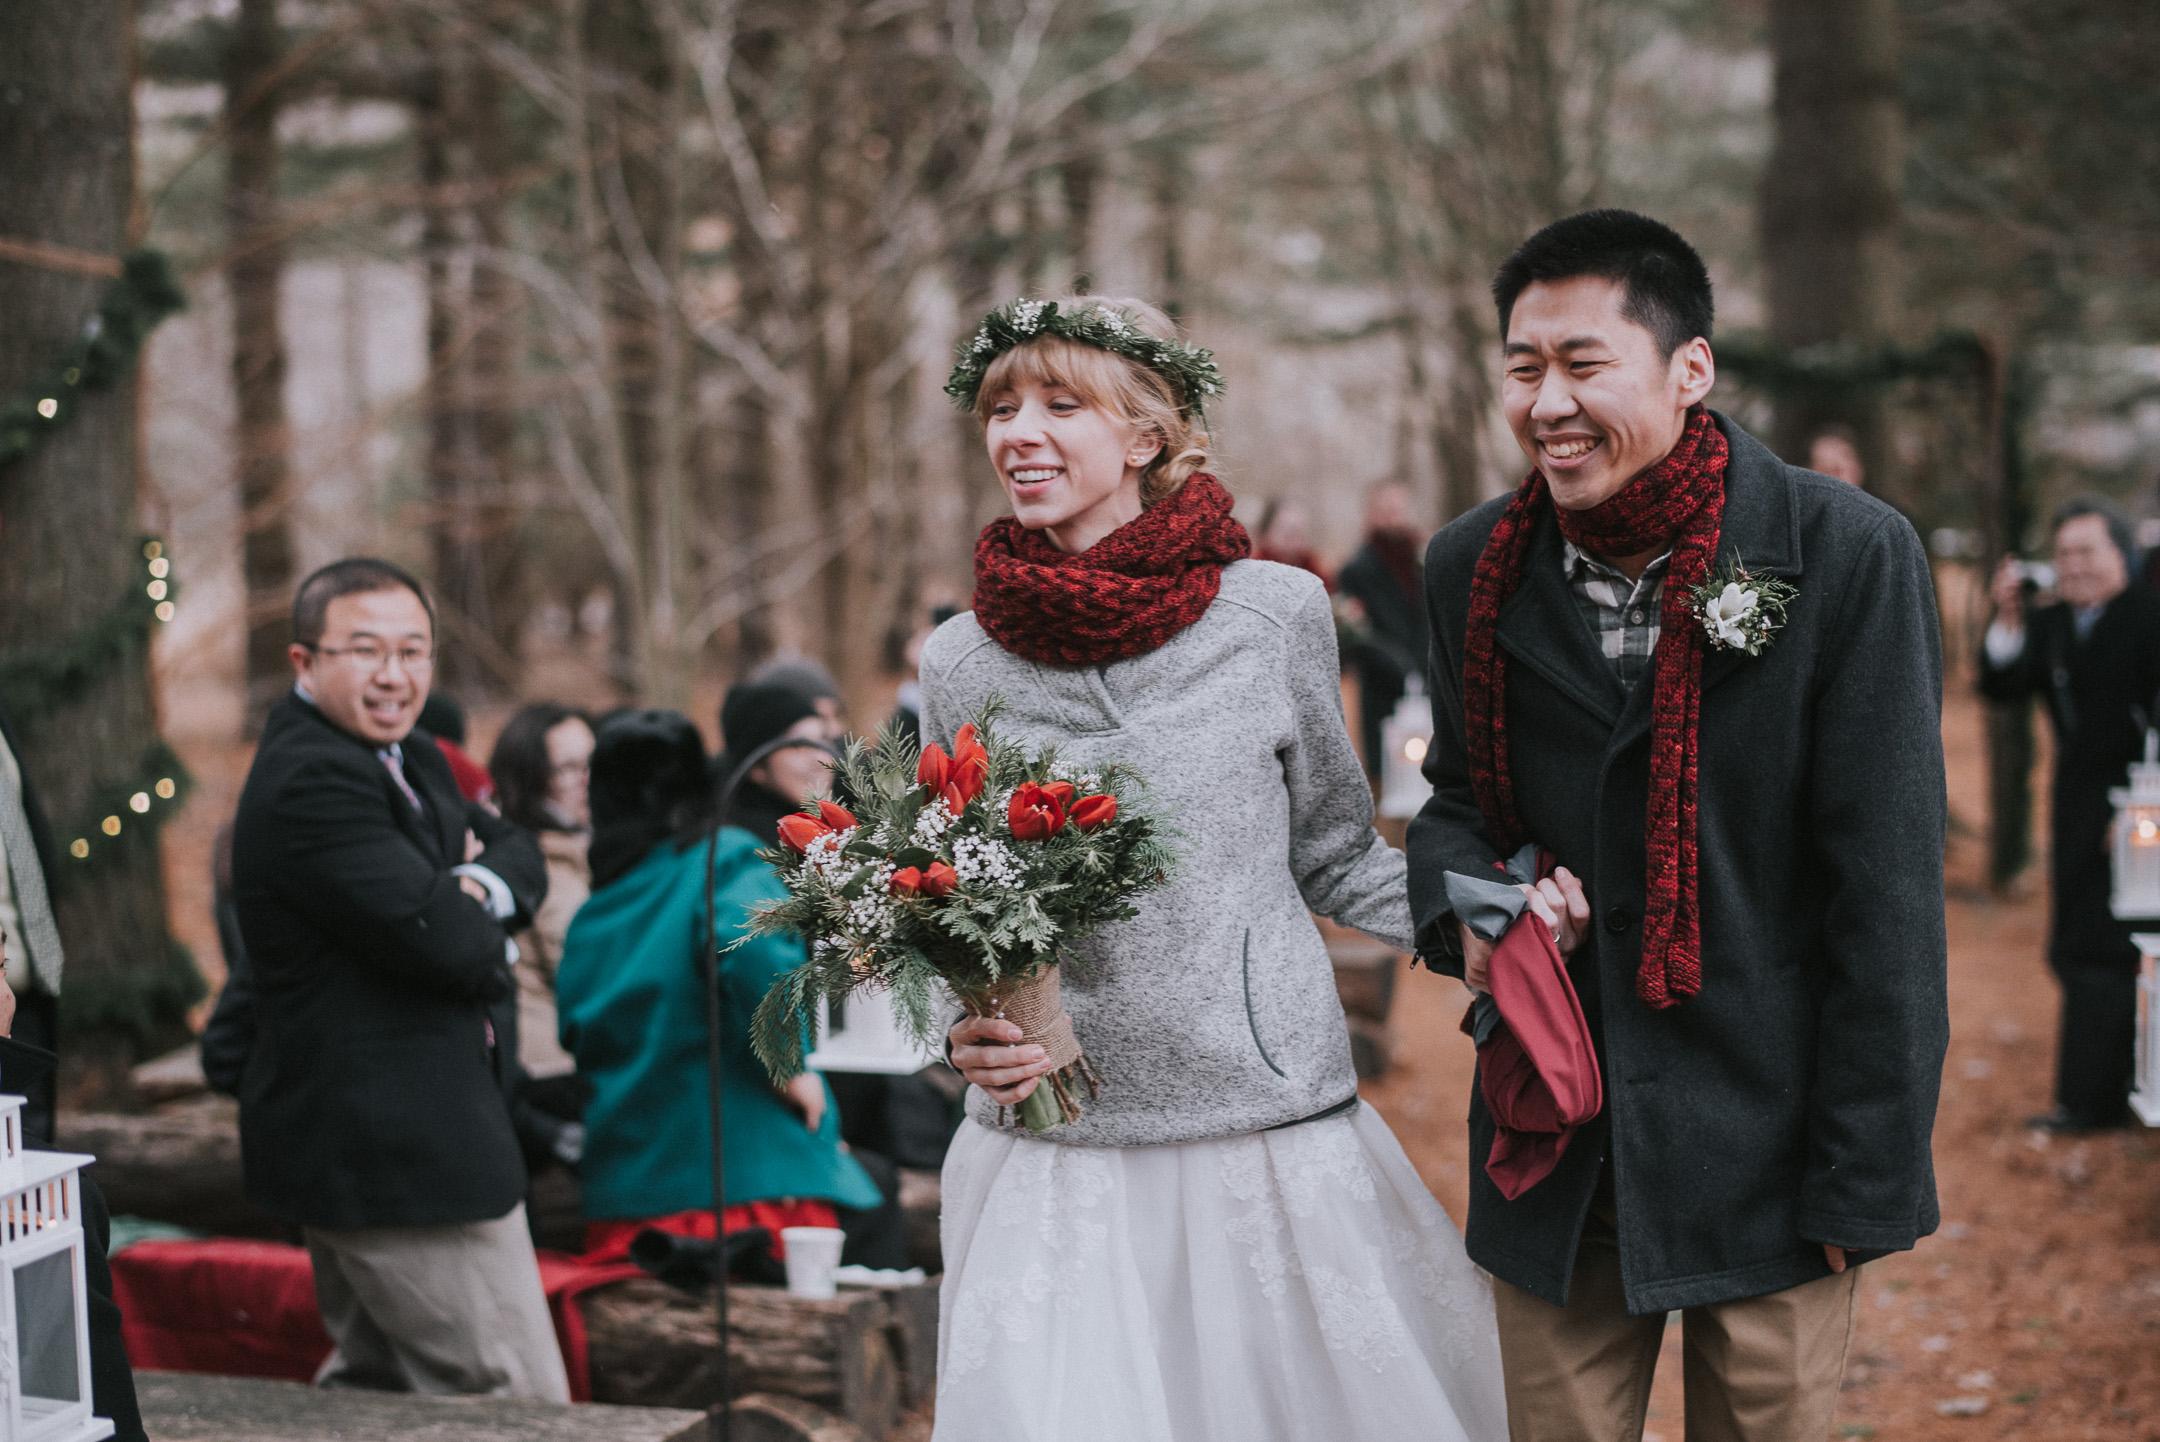 thurmont wedding photographer (36 of 38).jpg